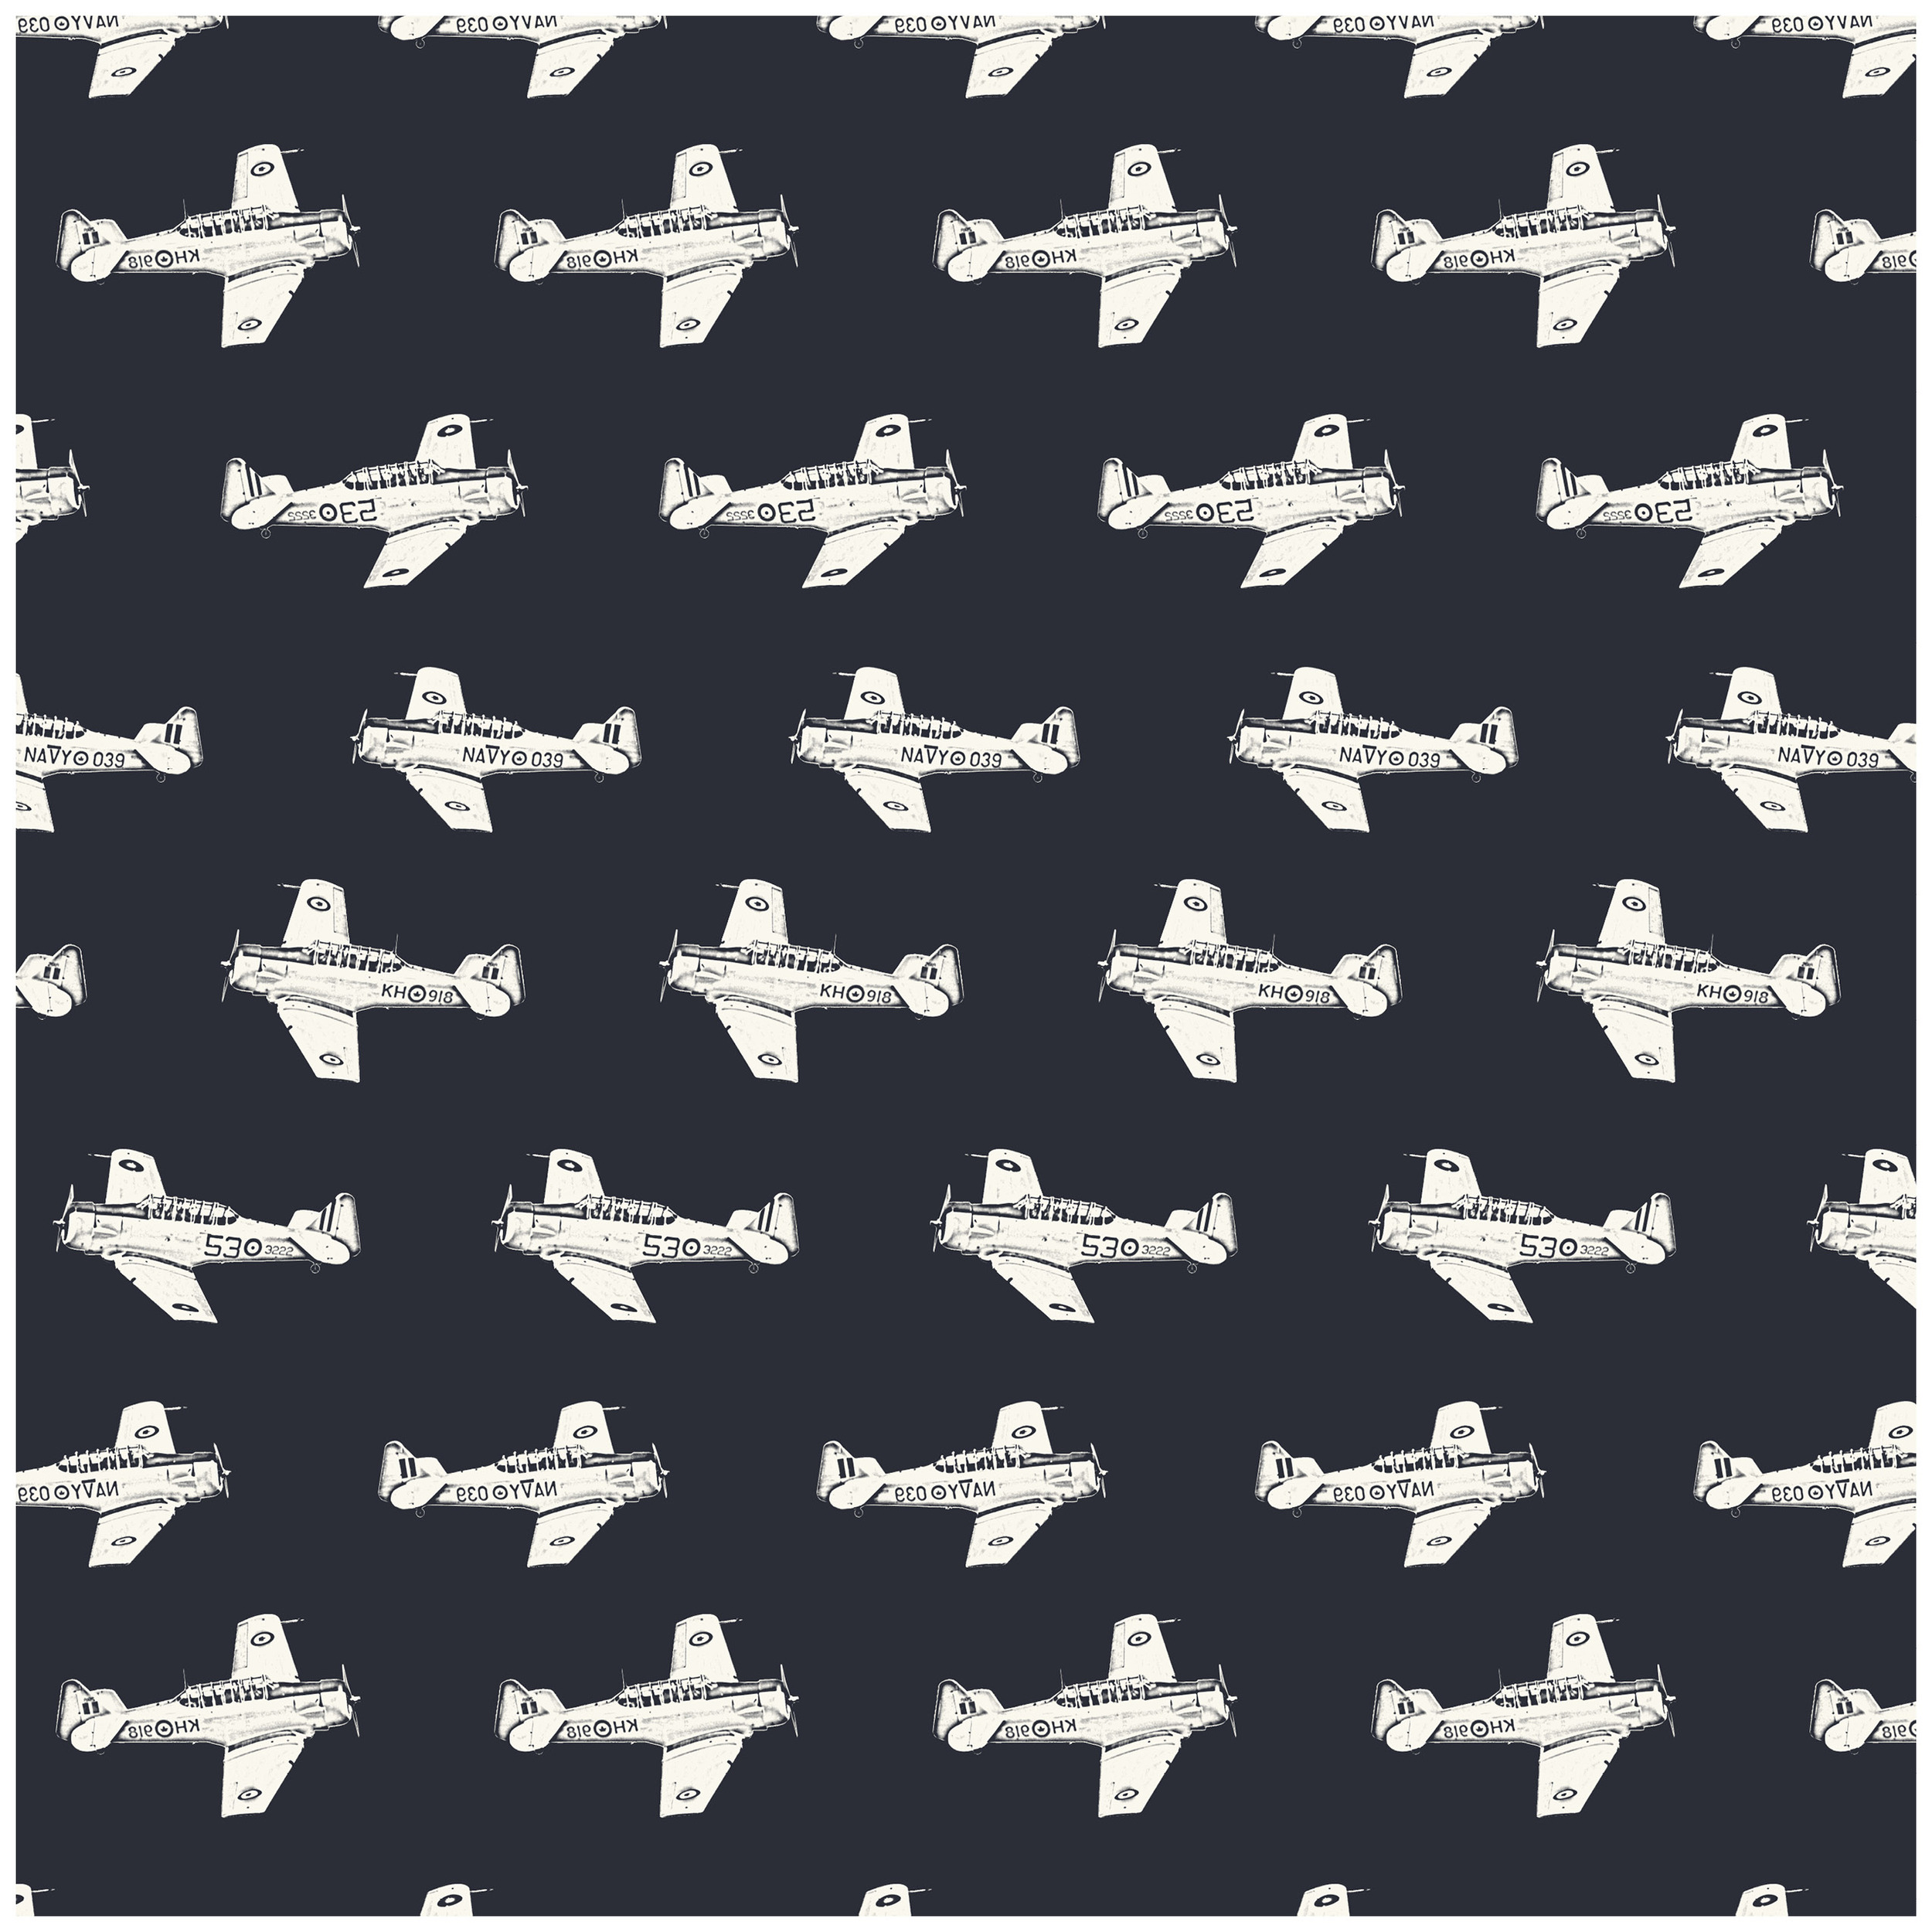 Aviator prints 1019144.jpg